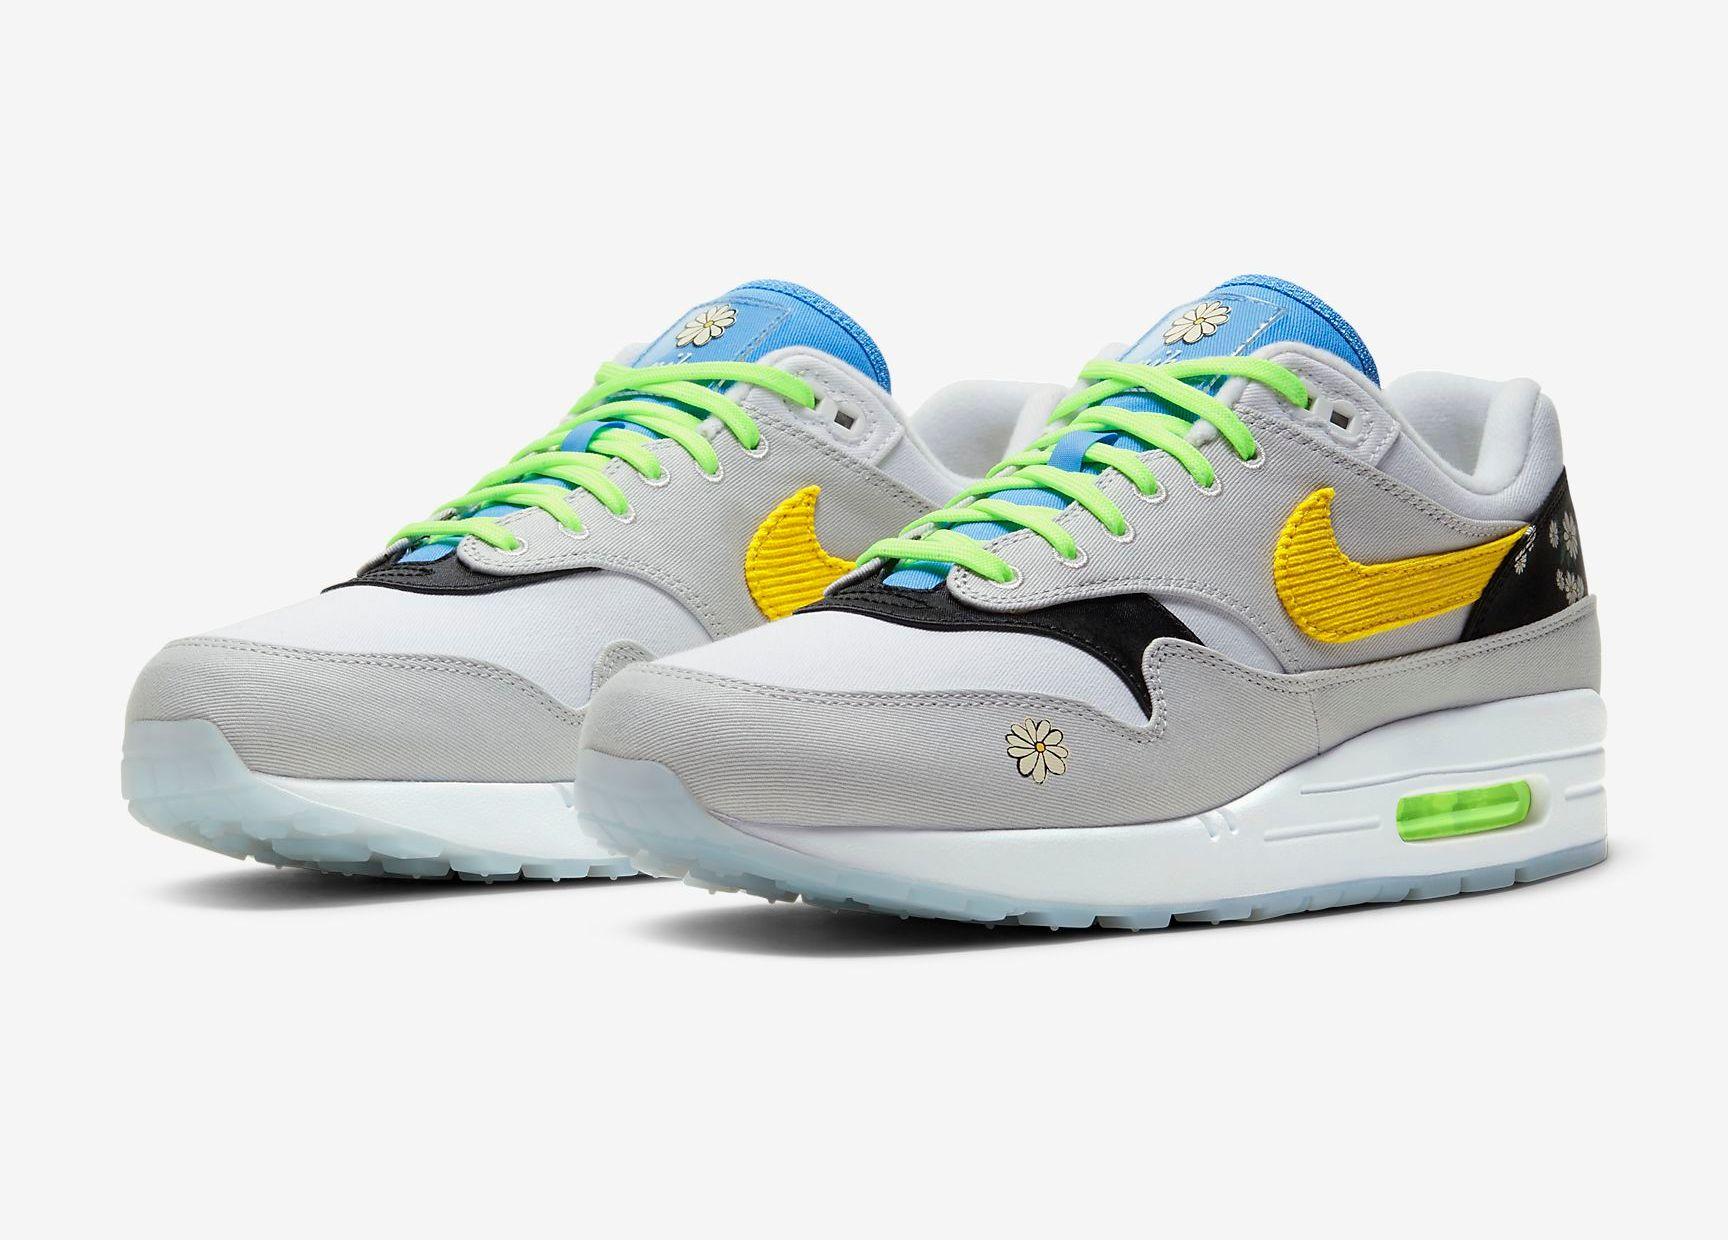 Nike Air Max 1 Daisy Angled